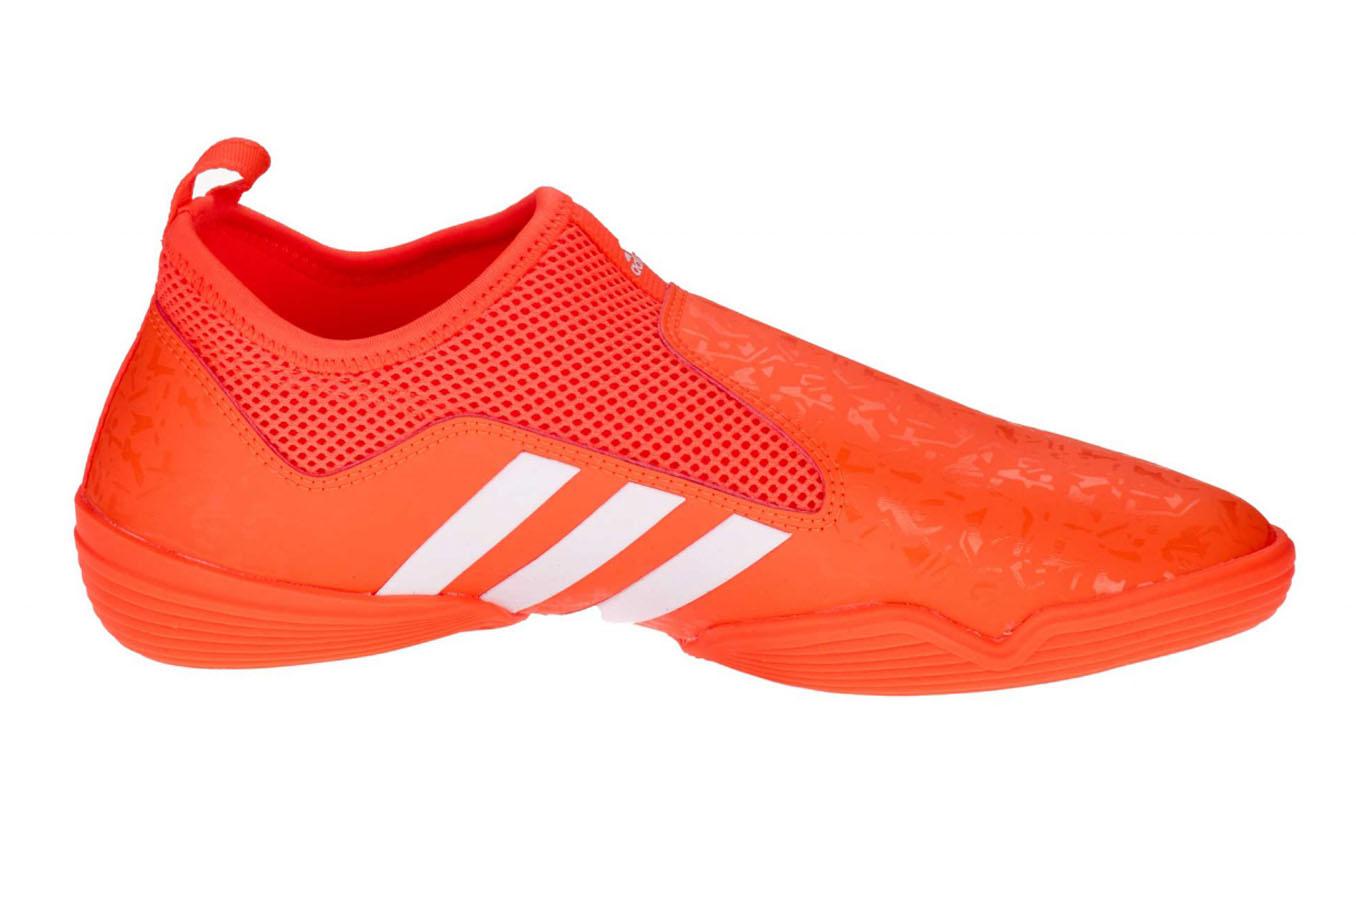 Zapatos de Taekwondo, Adikick ADITKK01, Adidas DragonSports.eu